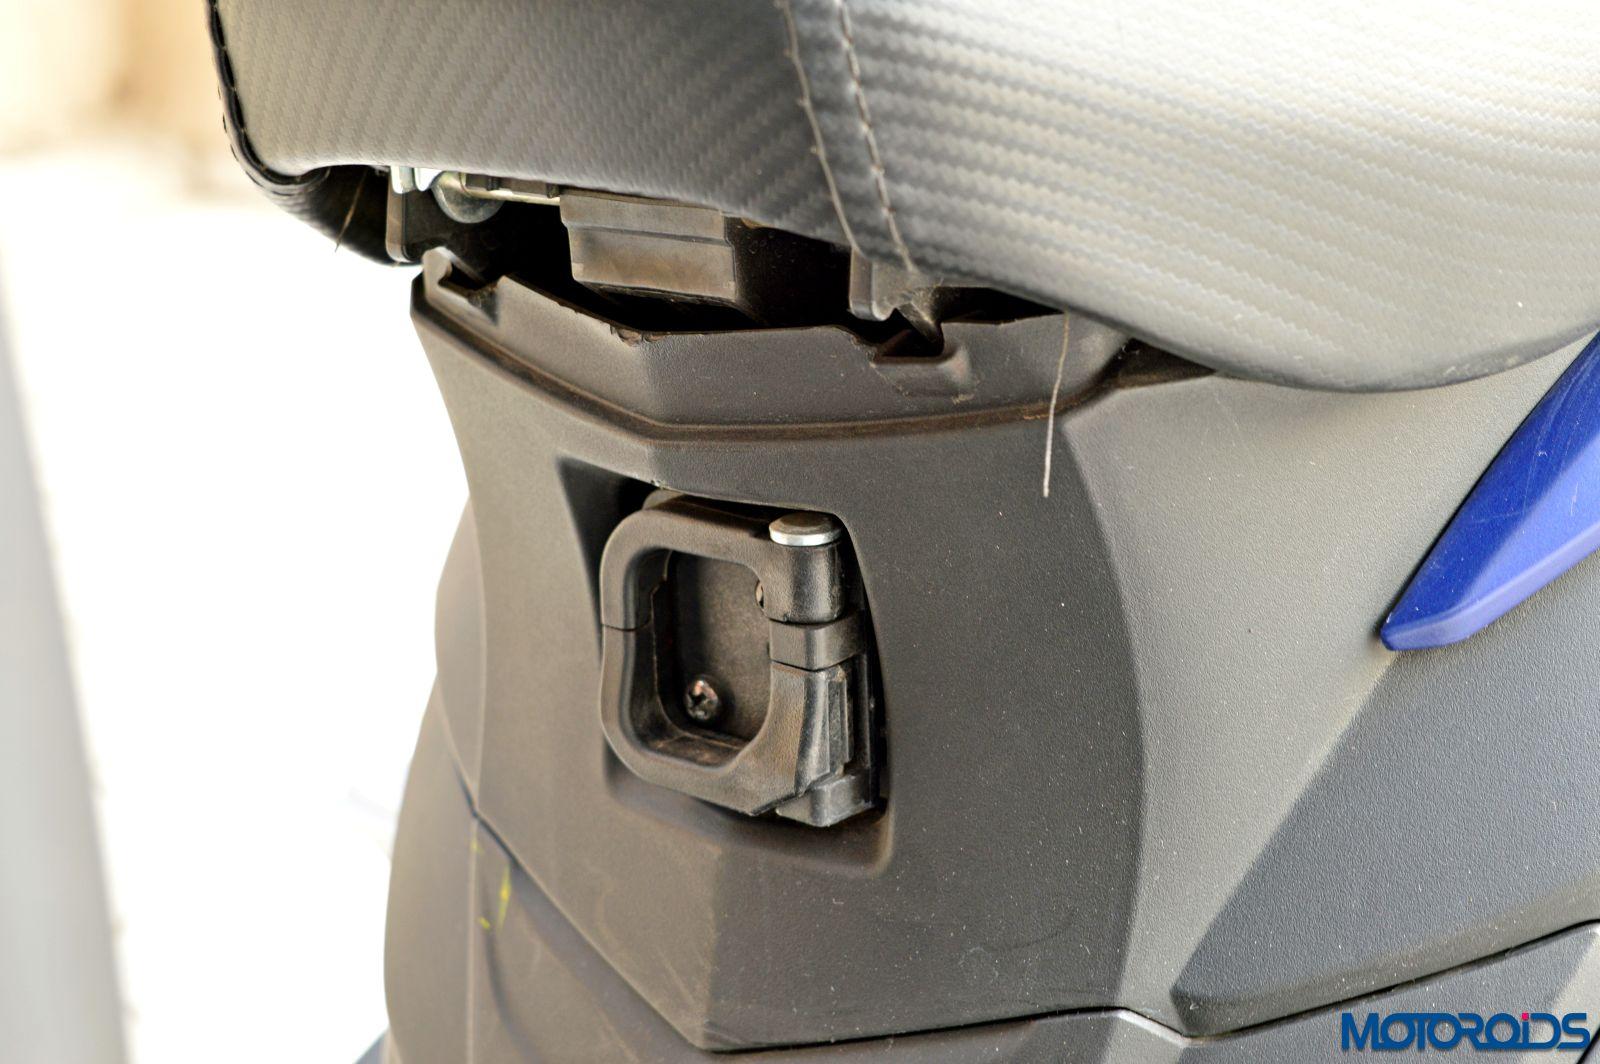 Hero Maestro Edge - Review - Details - Hook For Handbags (3)